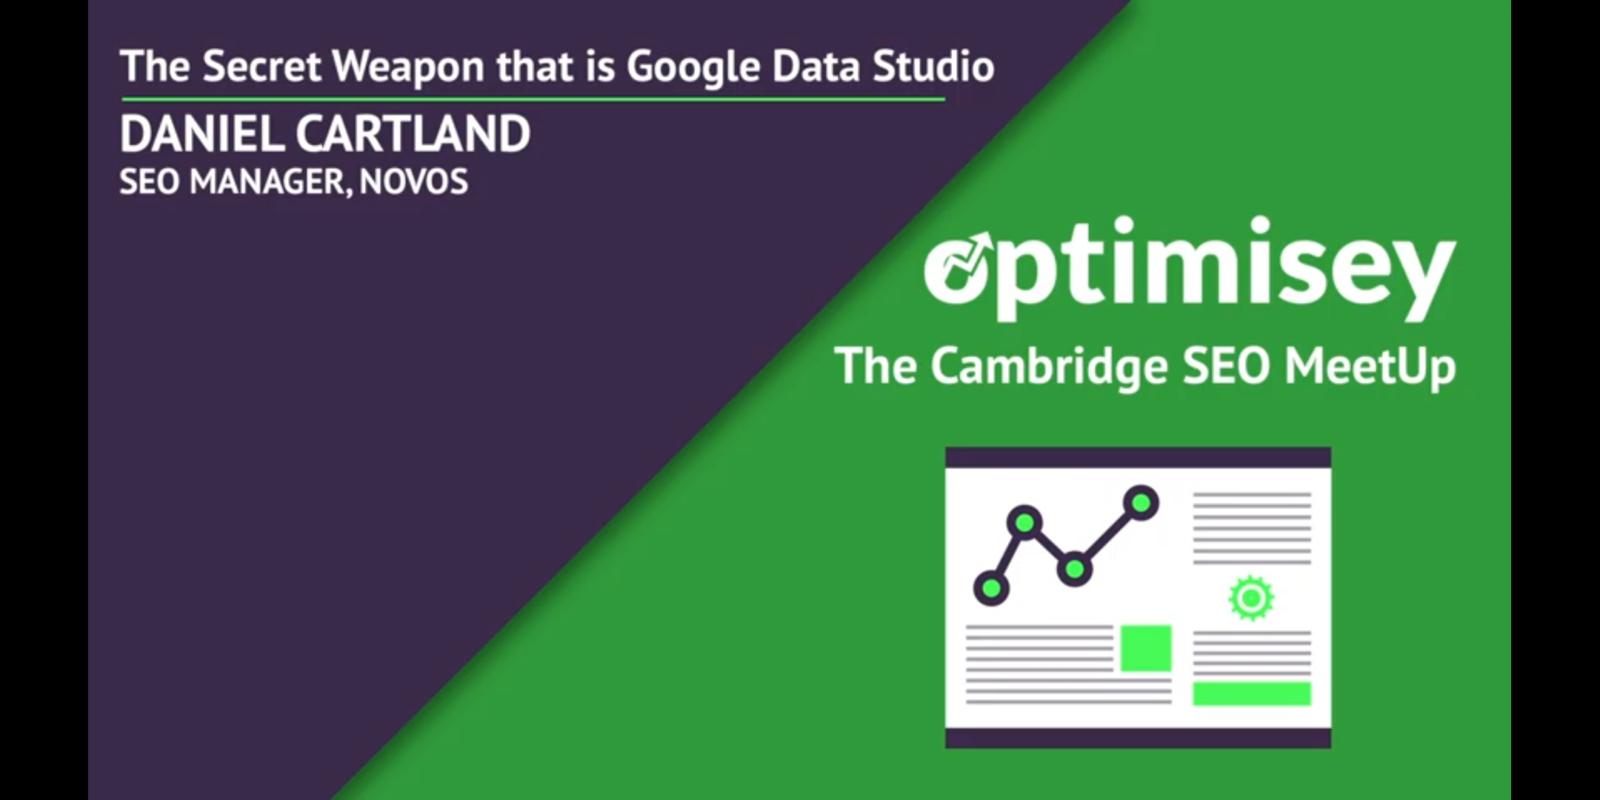 Dan Cartland's talk at the Optimisey SEO event - on Google Data Studio